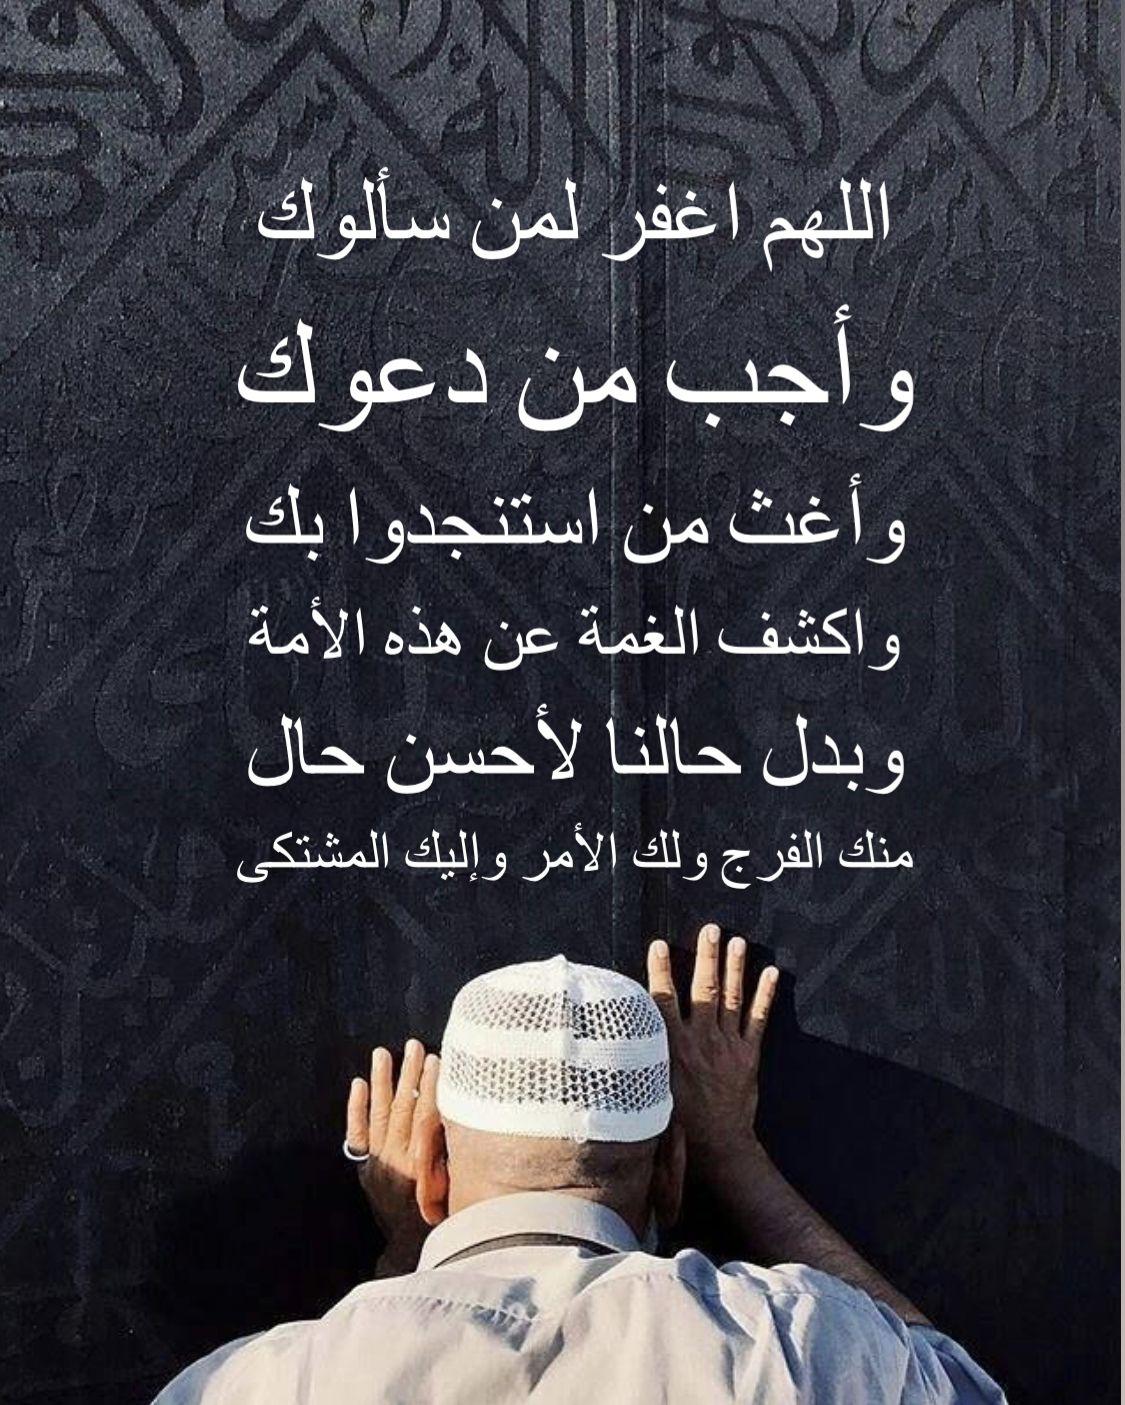 Pin By Eman Gamal El Din On دعاء Islamic Phrases Islamic Quotes Beautiful Arabic Words